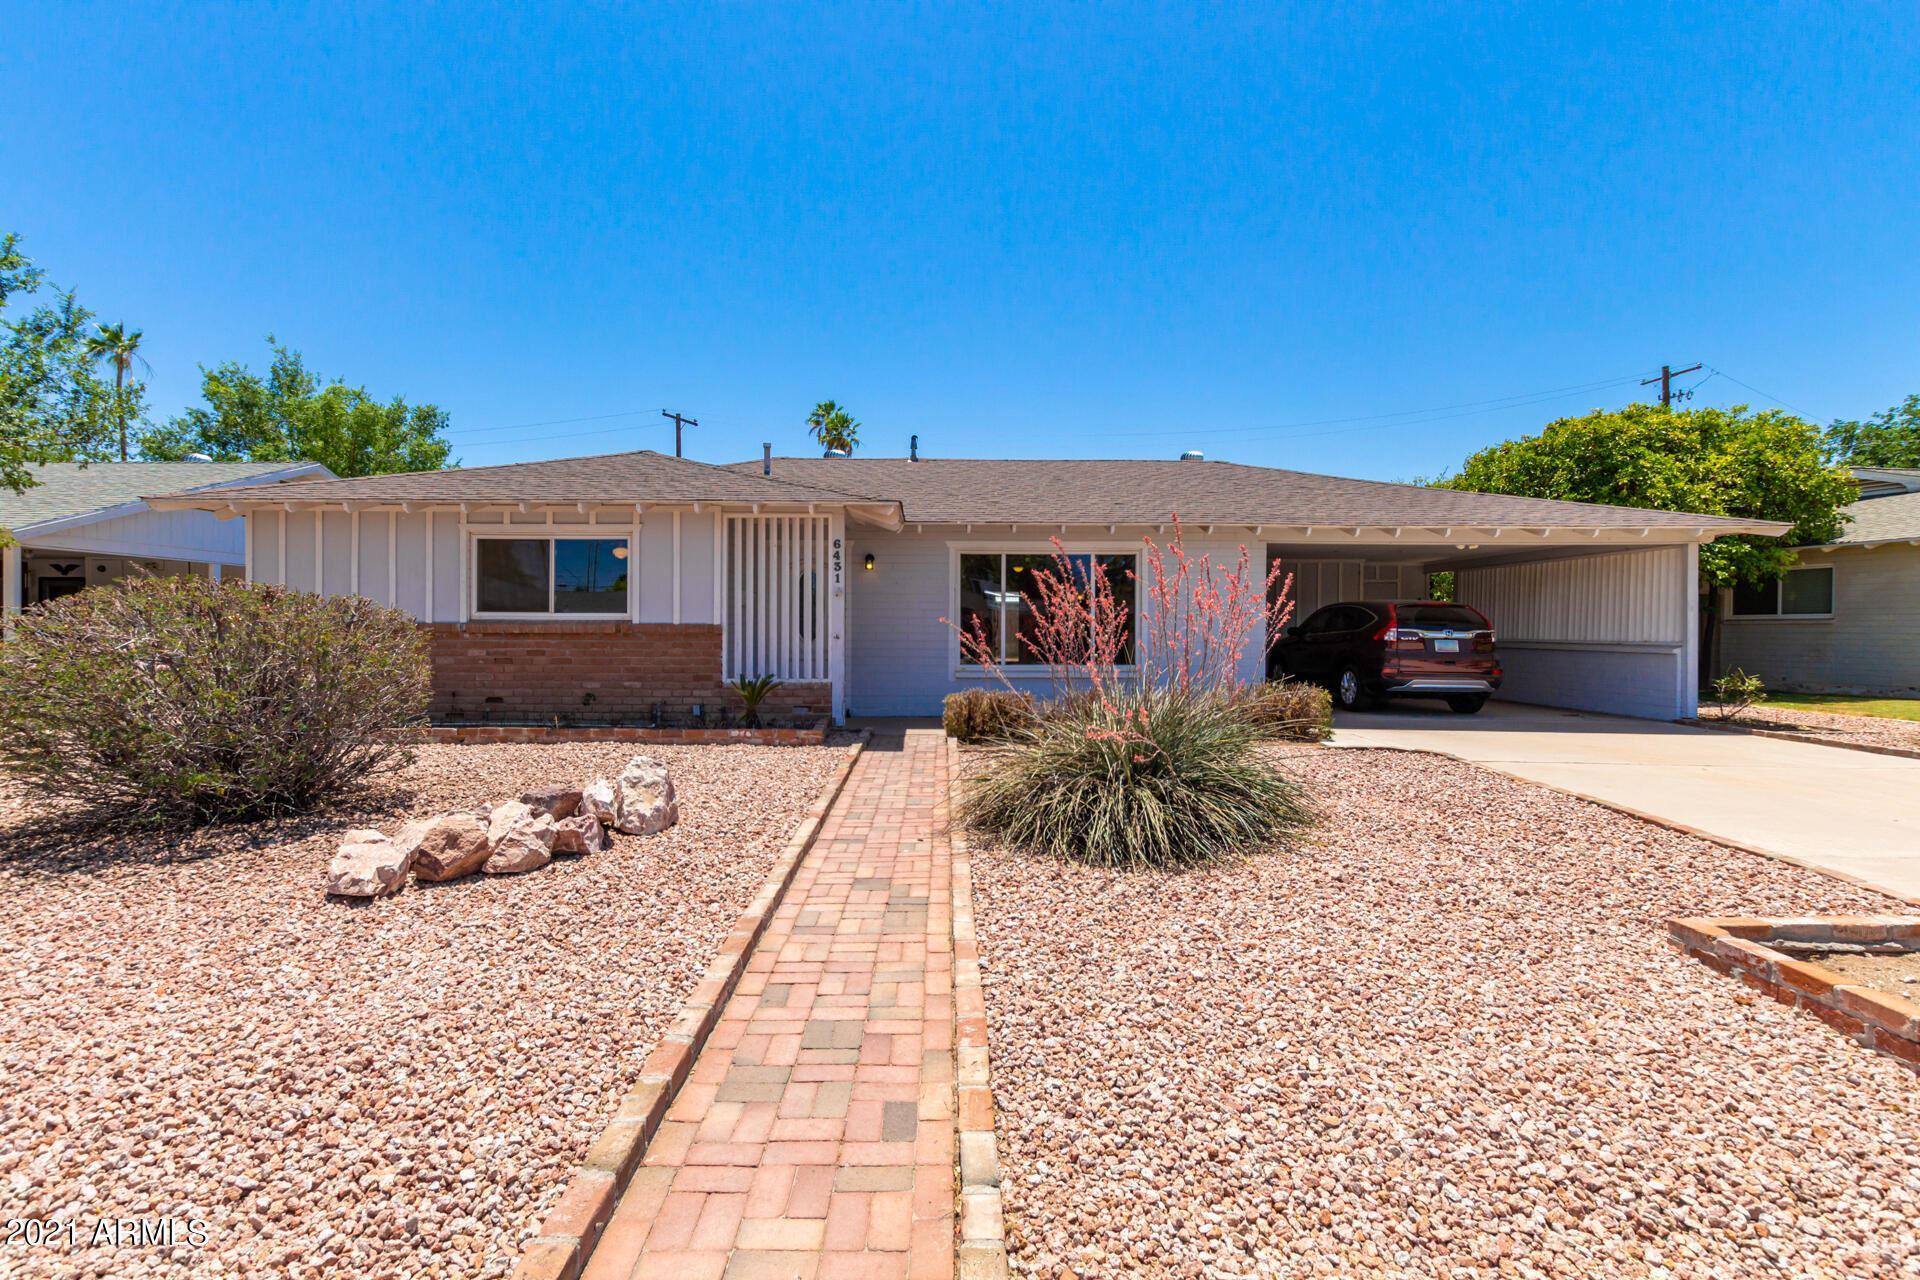 6431 E Lewis Avenue, Scottsdale, AZ 85257 - MLS#: 6244745